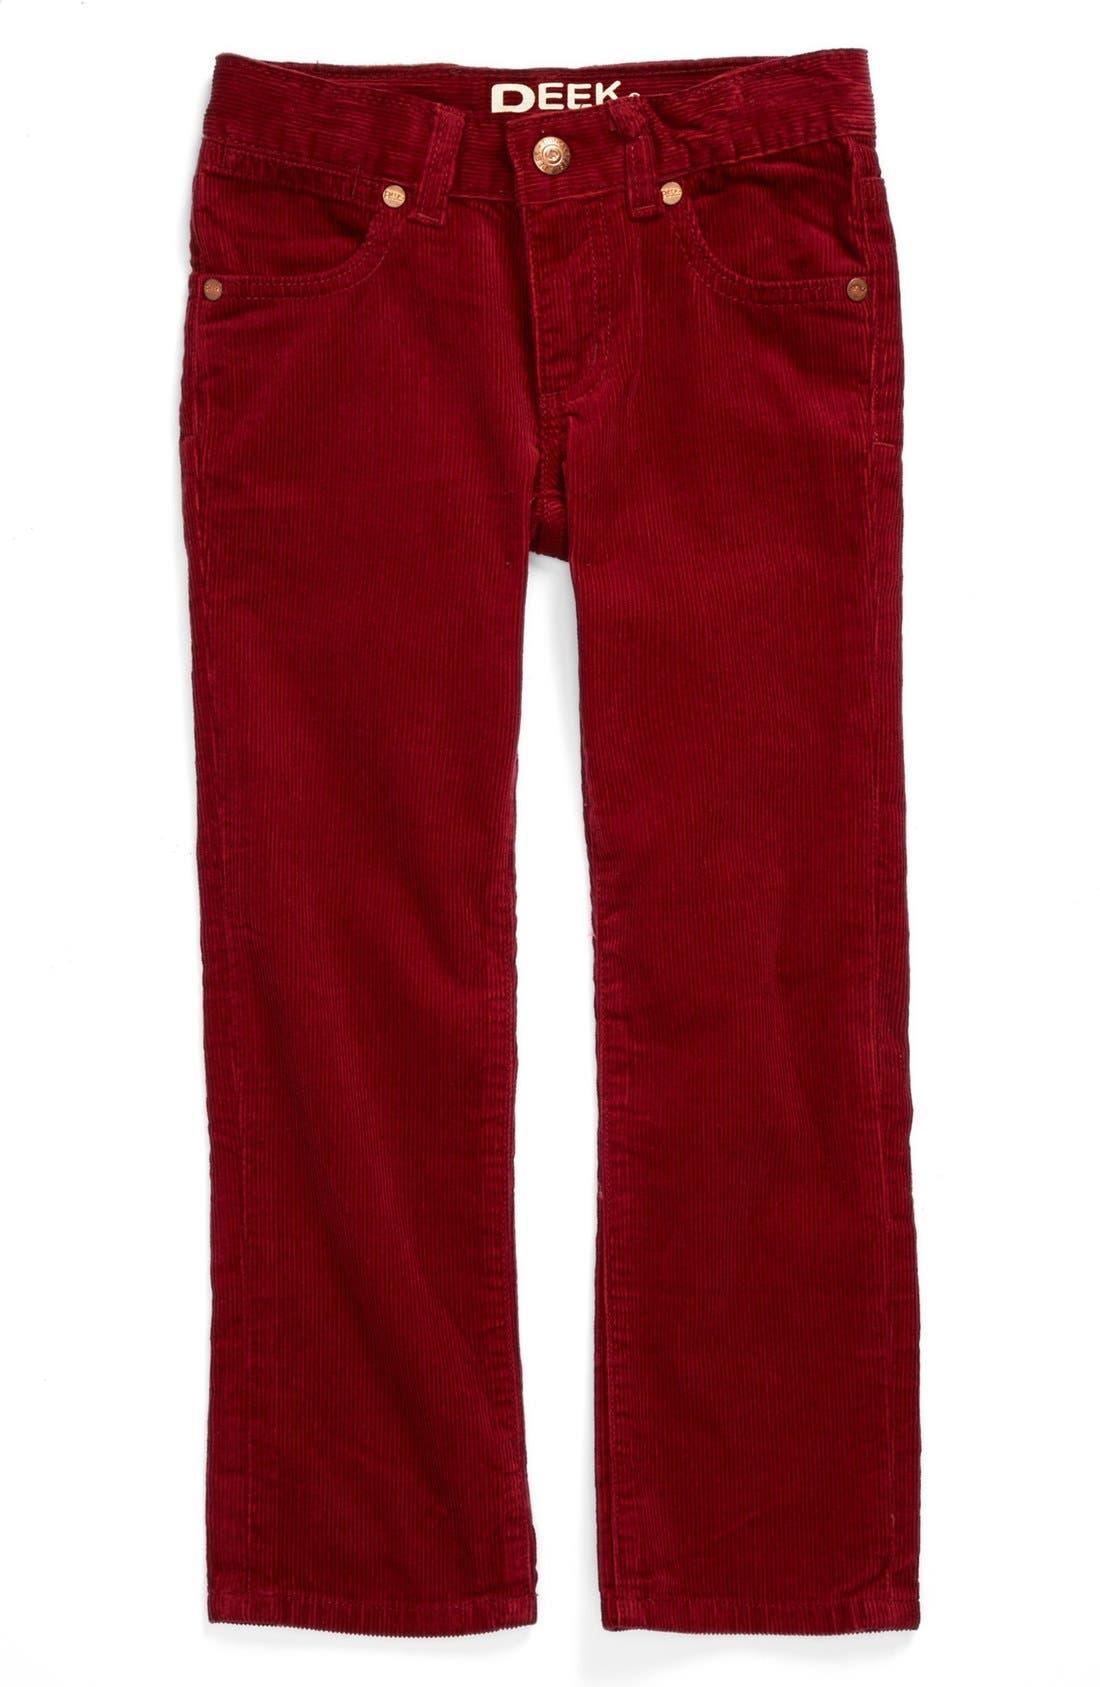 Main Image - Peek Straight Leg Corduroy Pants (Baby Boys)